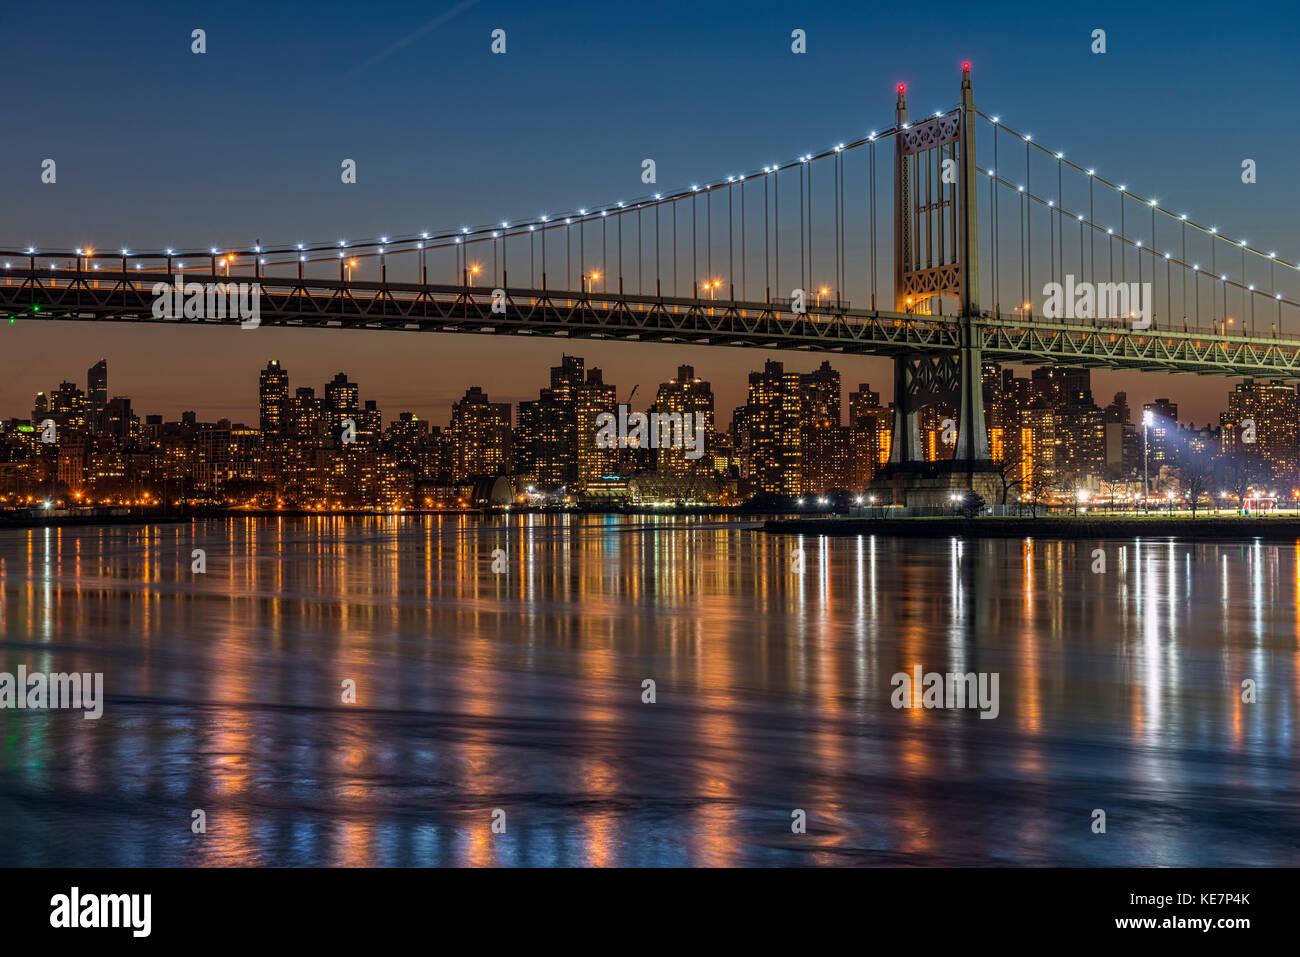 Rfk Triboro Bridge At Twilight; New York City, New York, United States Of America - Stock Image